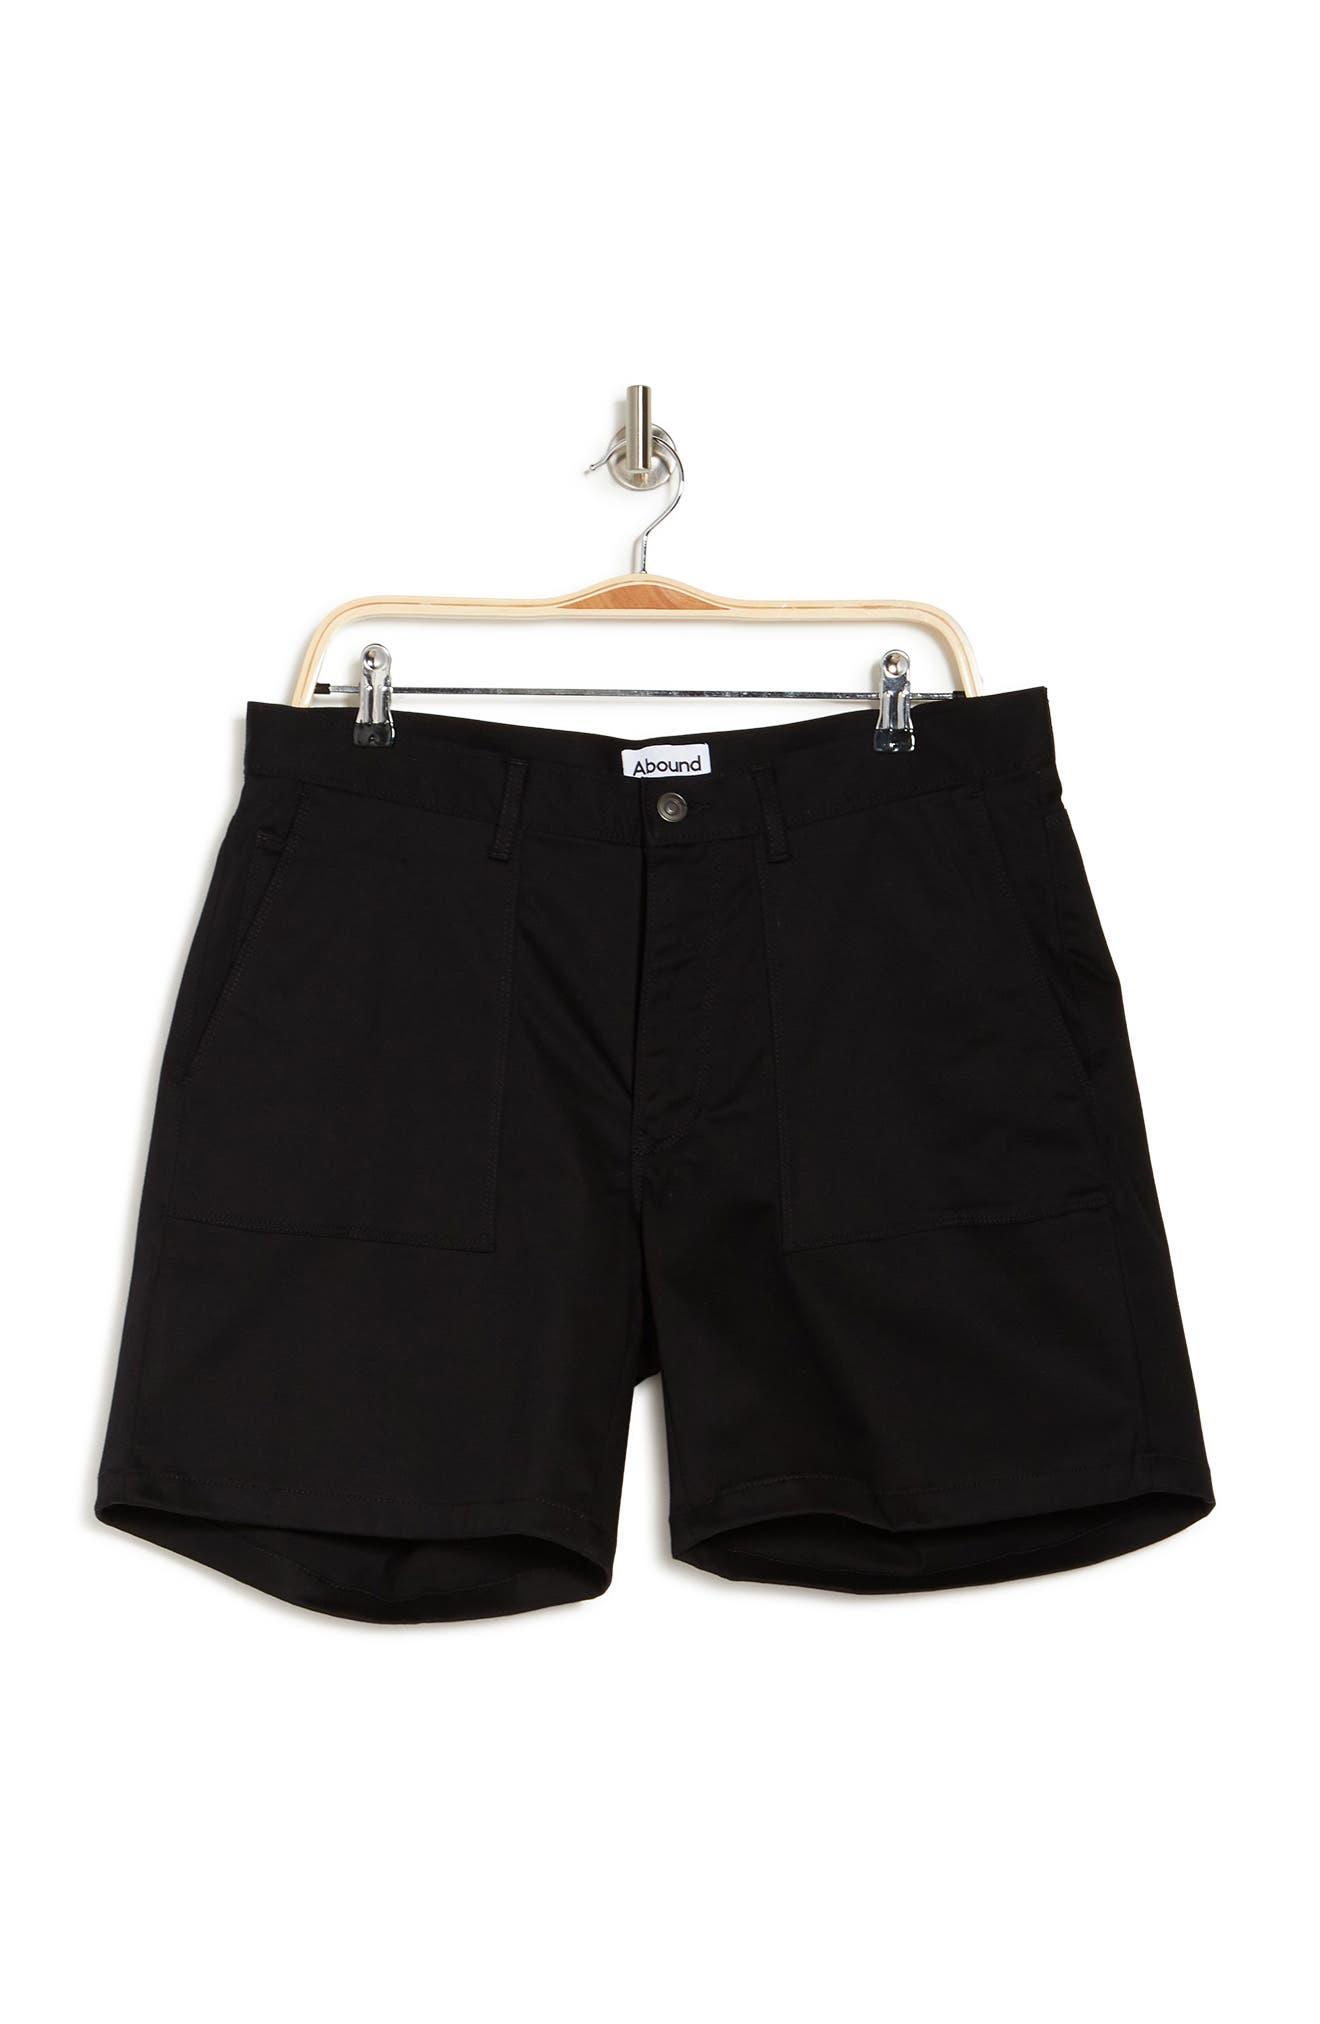 Image of Abound Workwear Walk Shorts